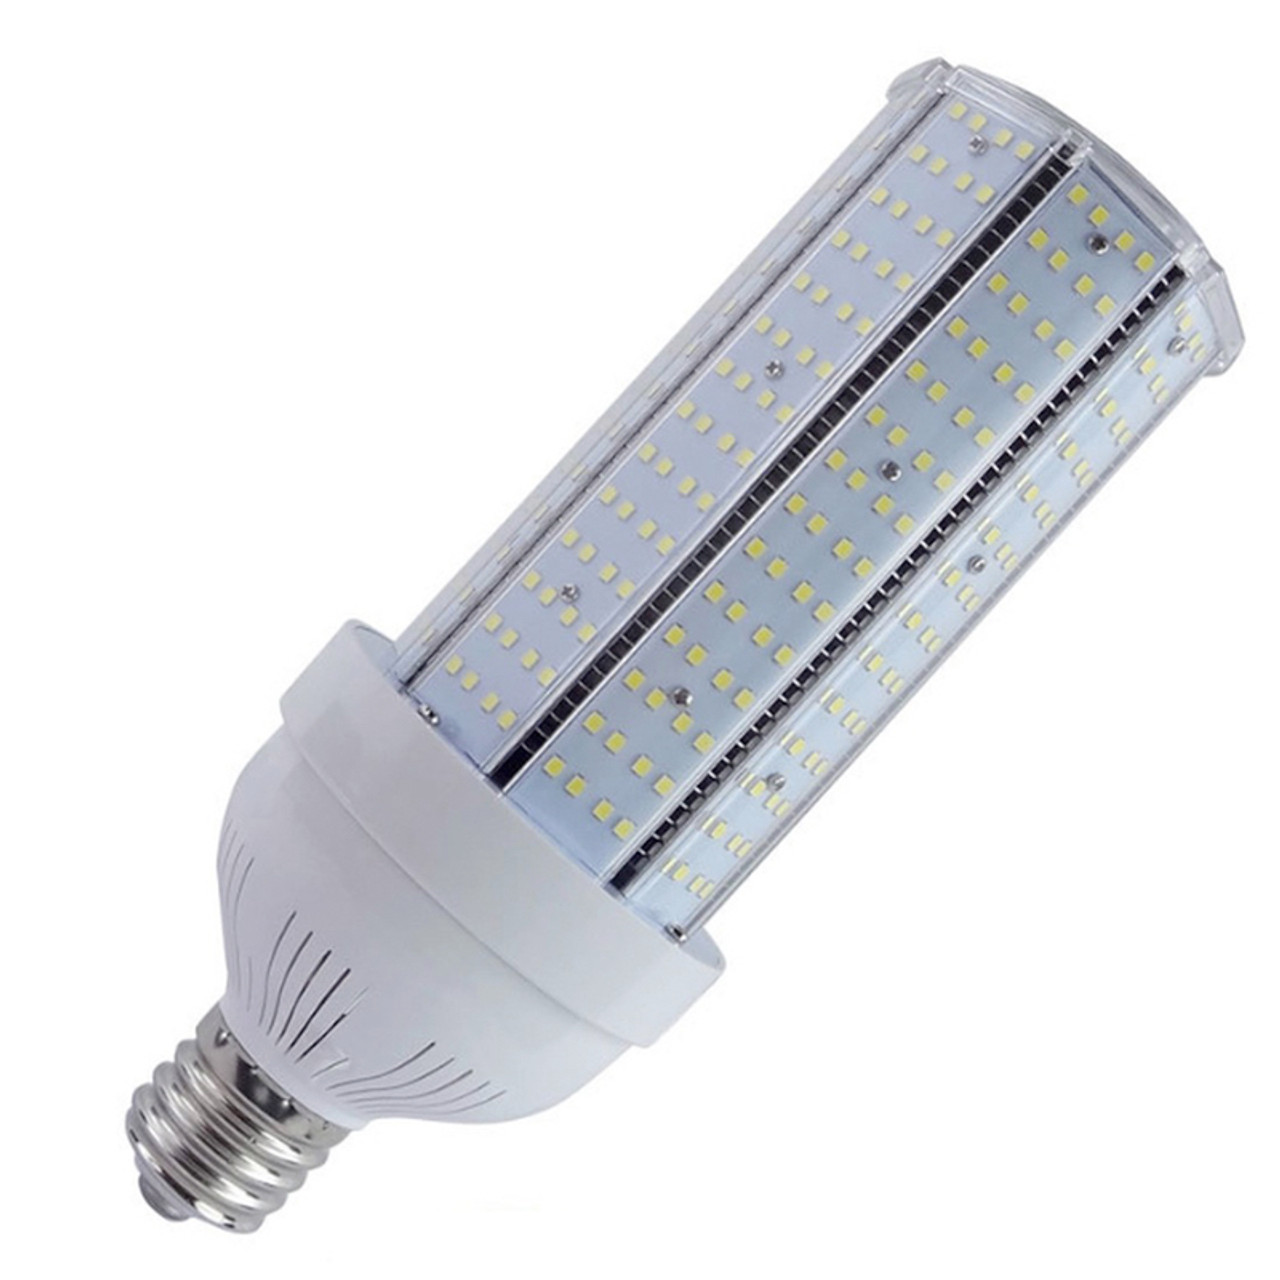 1000 Watt Metal Halide Led Replacement 80 watt led retrofit corn bulb, replaces 250 watt hid, 12,000 lumens, dlc  listed, 50,000 hours, 10 year warranty